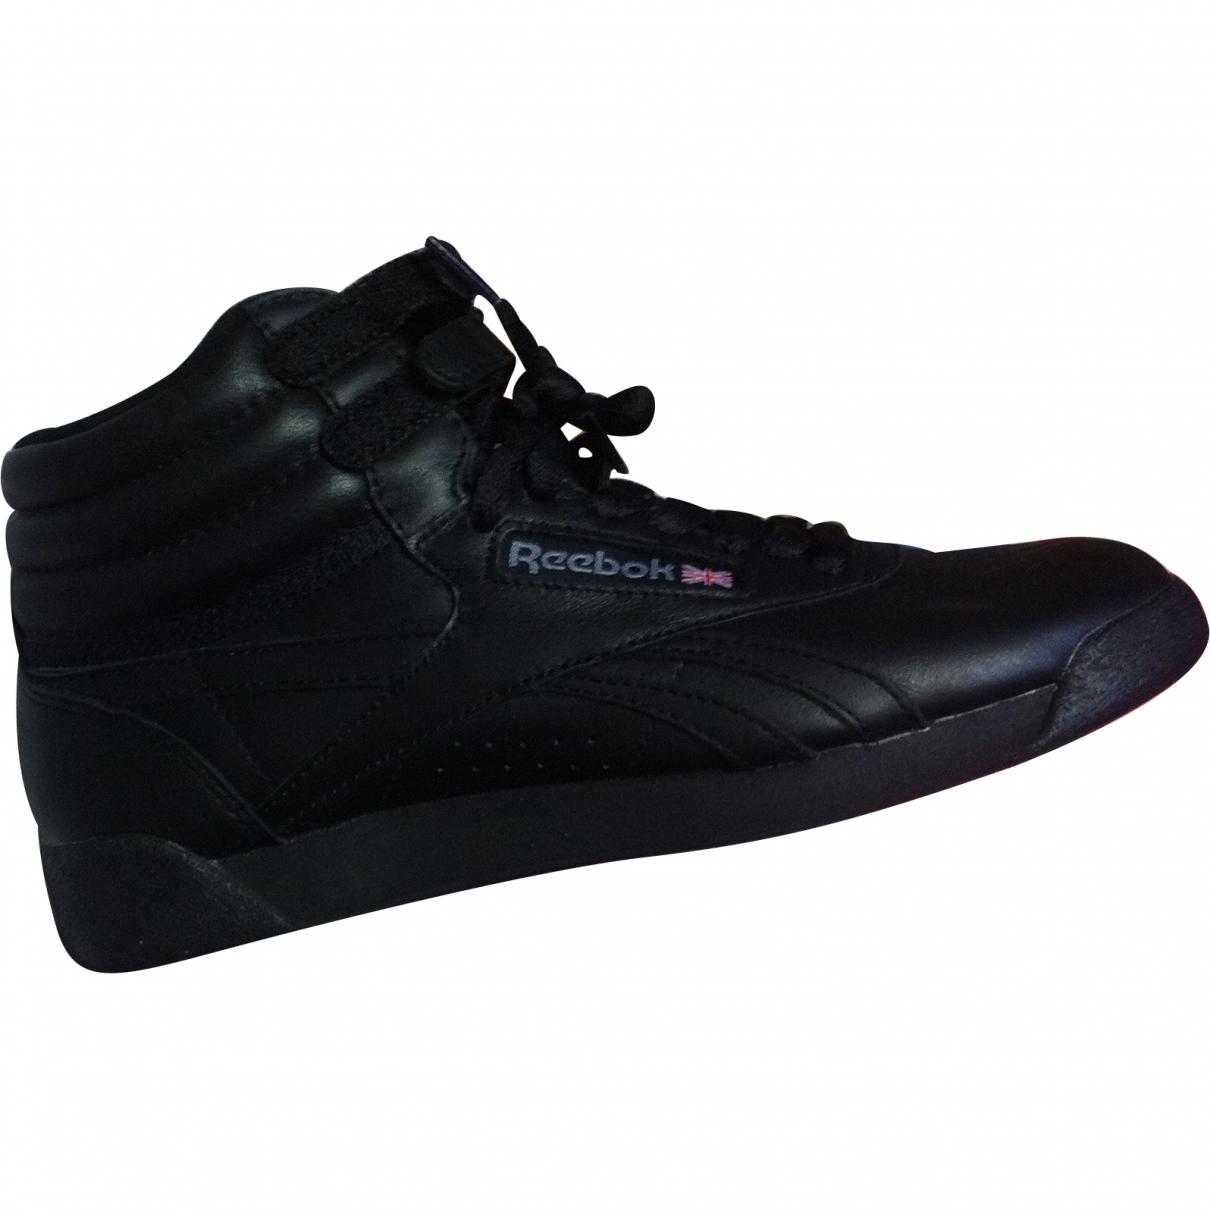 Reebok \N Black Leather Trainers for Women 37 EU